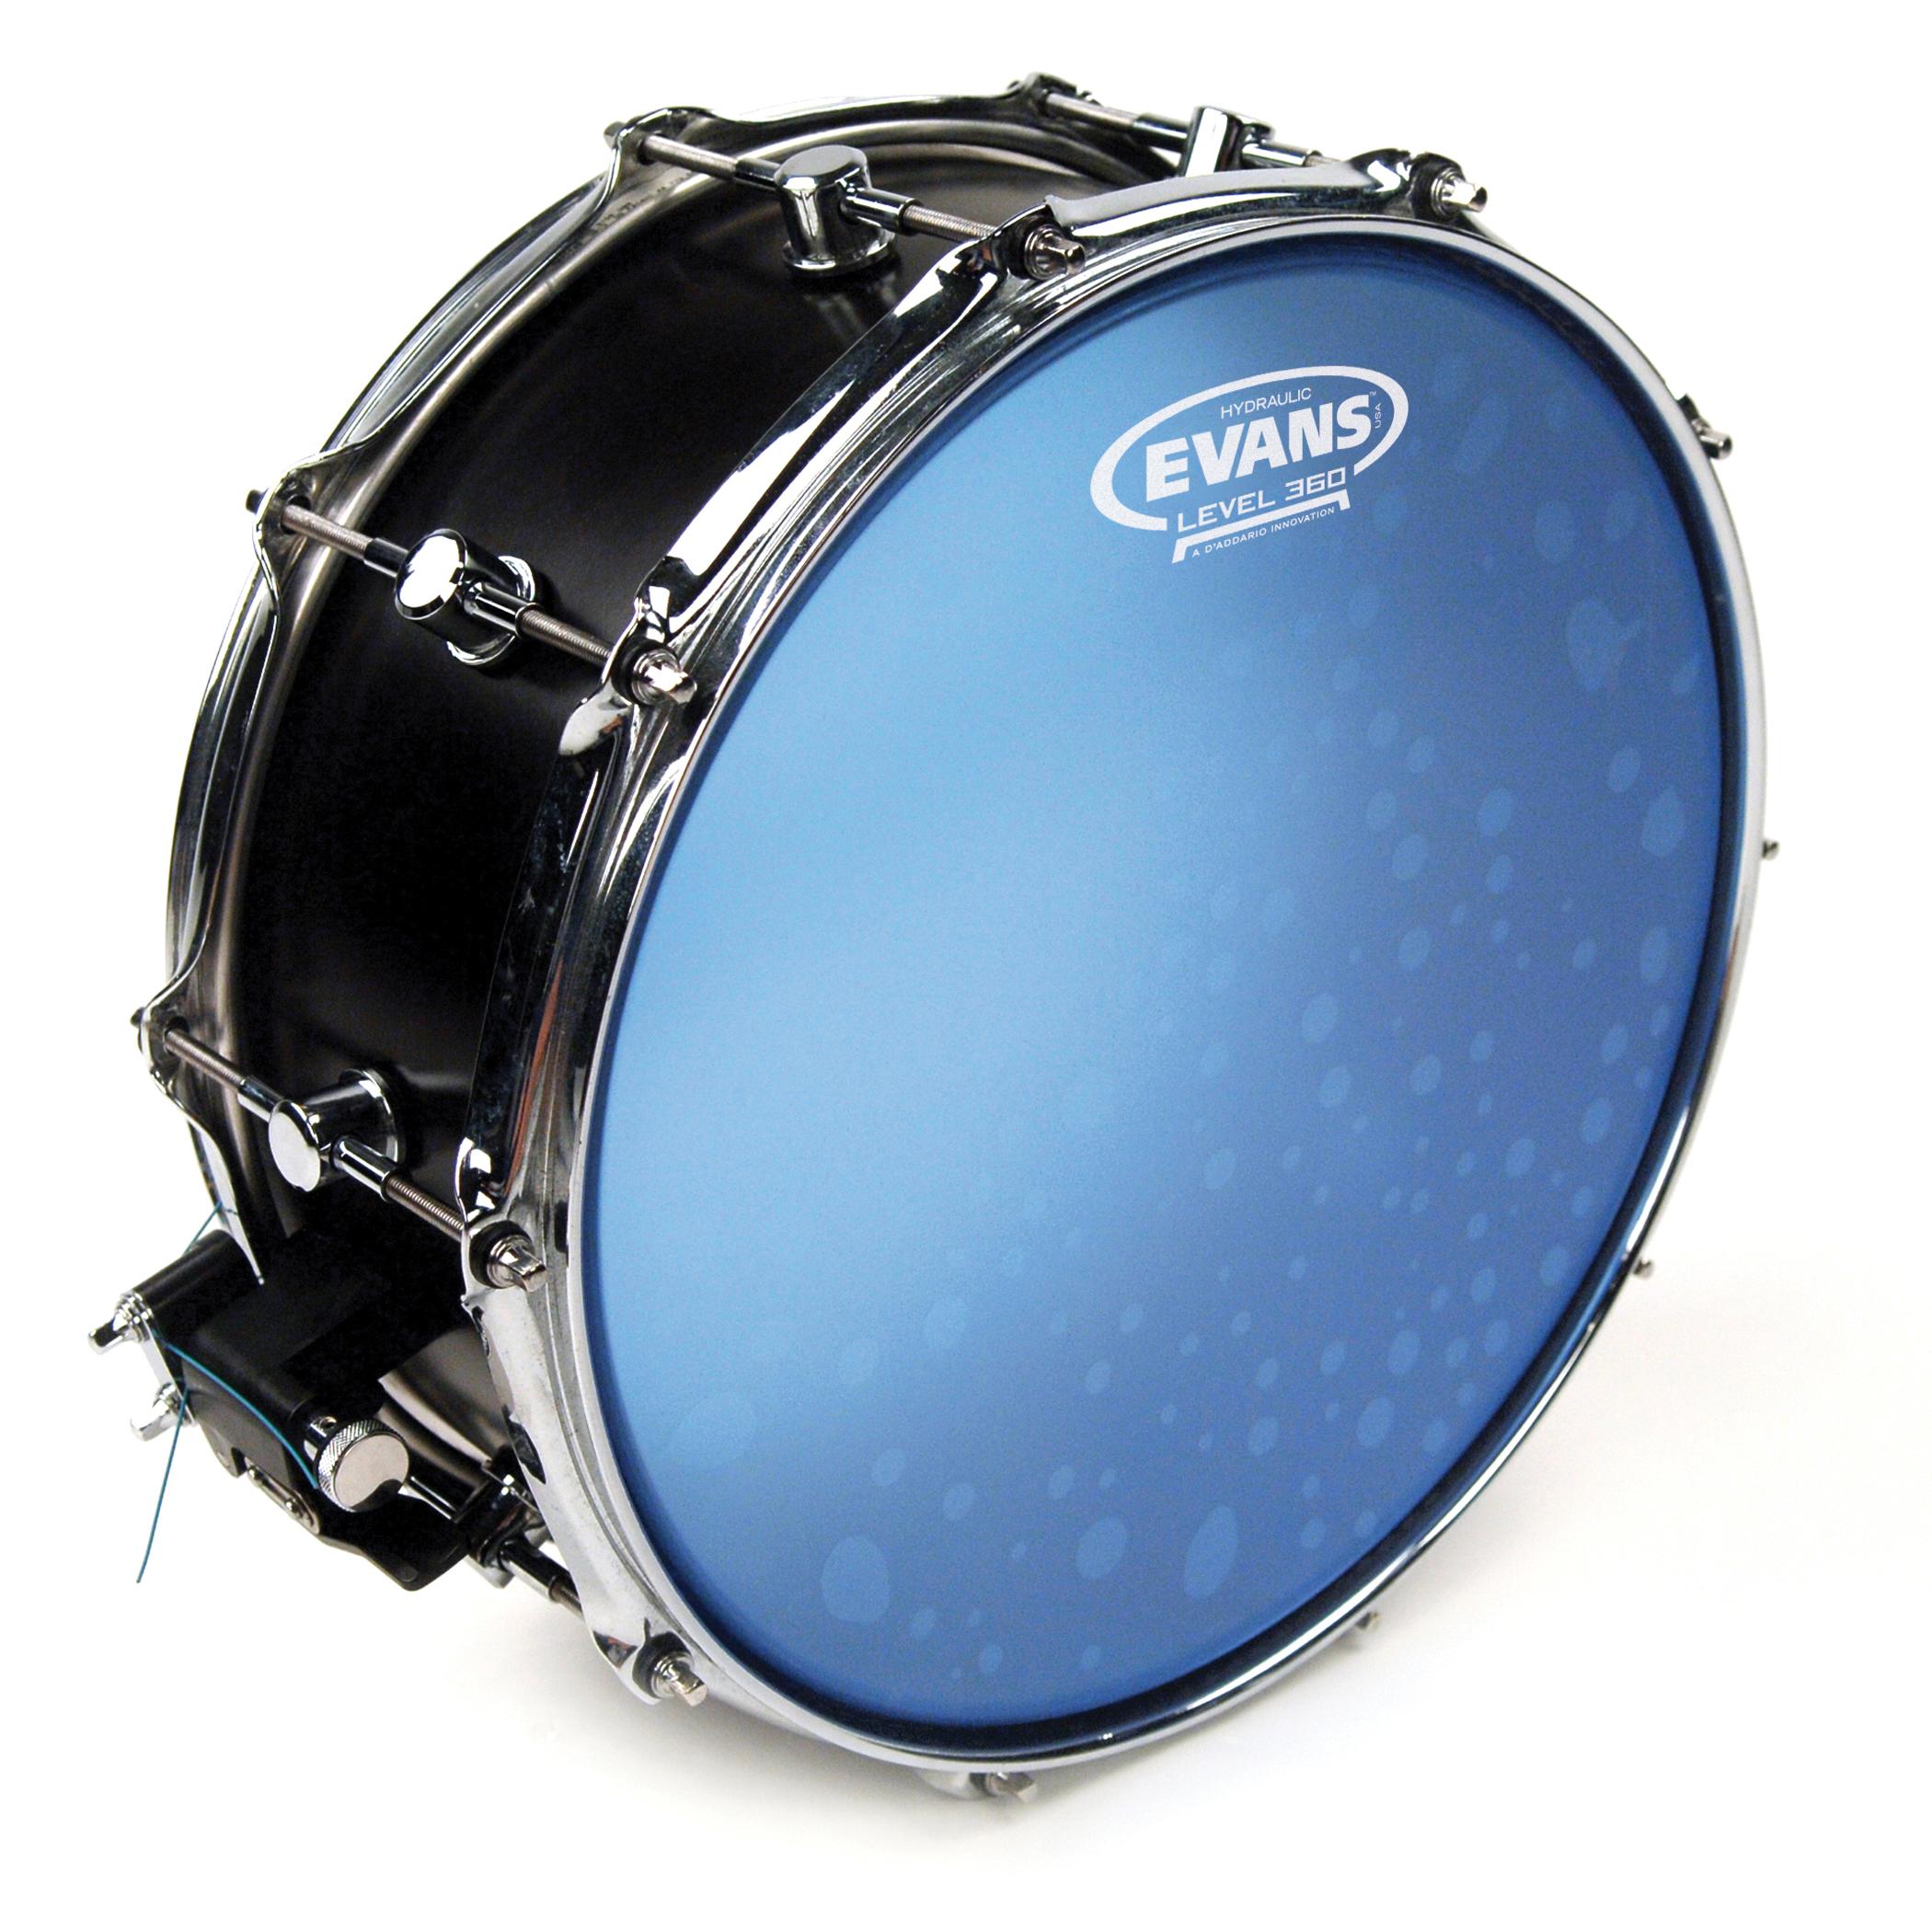 Evans Genera Drum Head 14 Inch